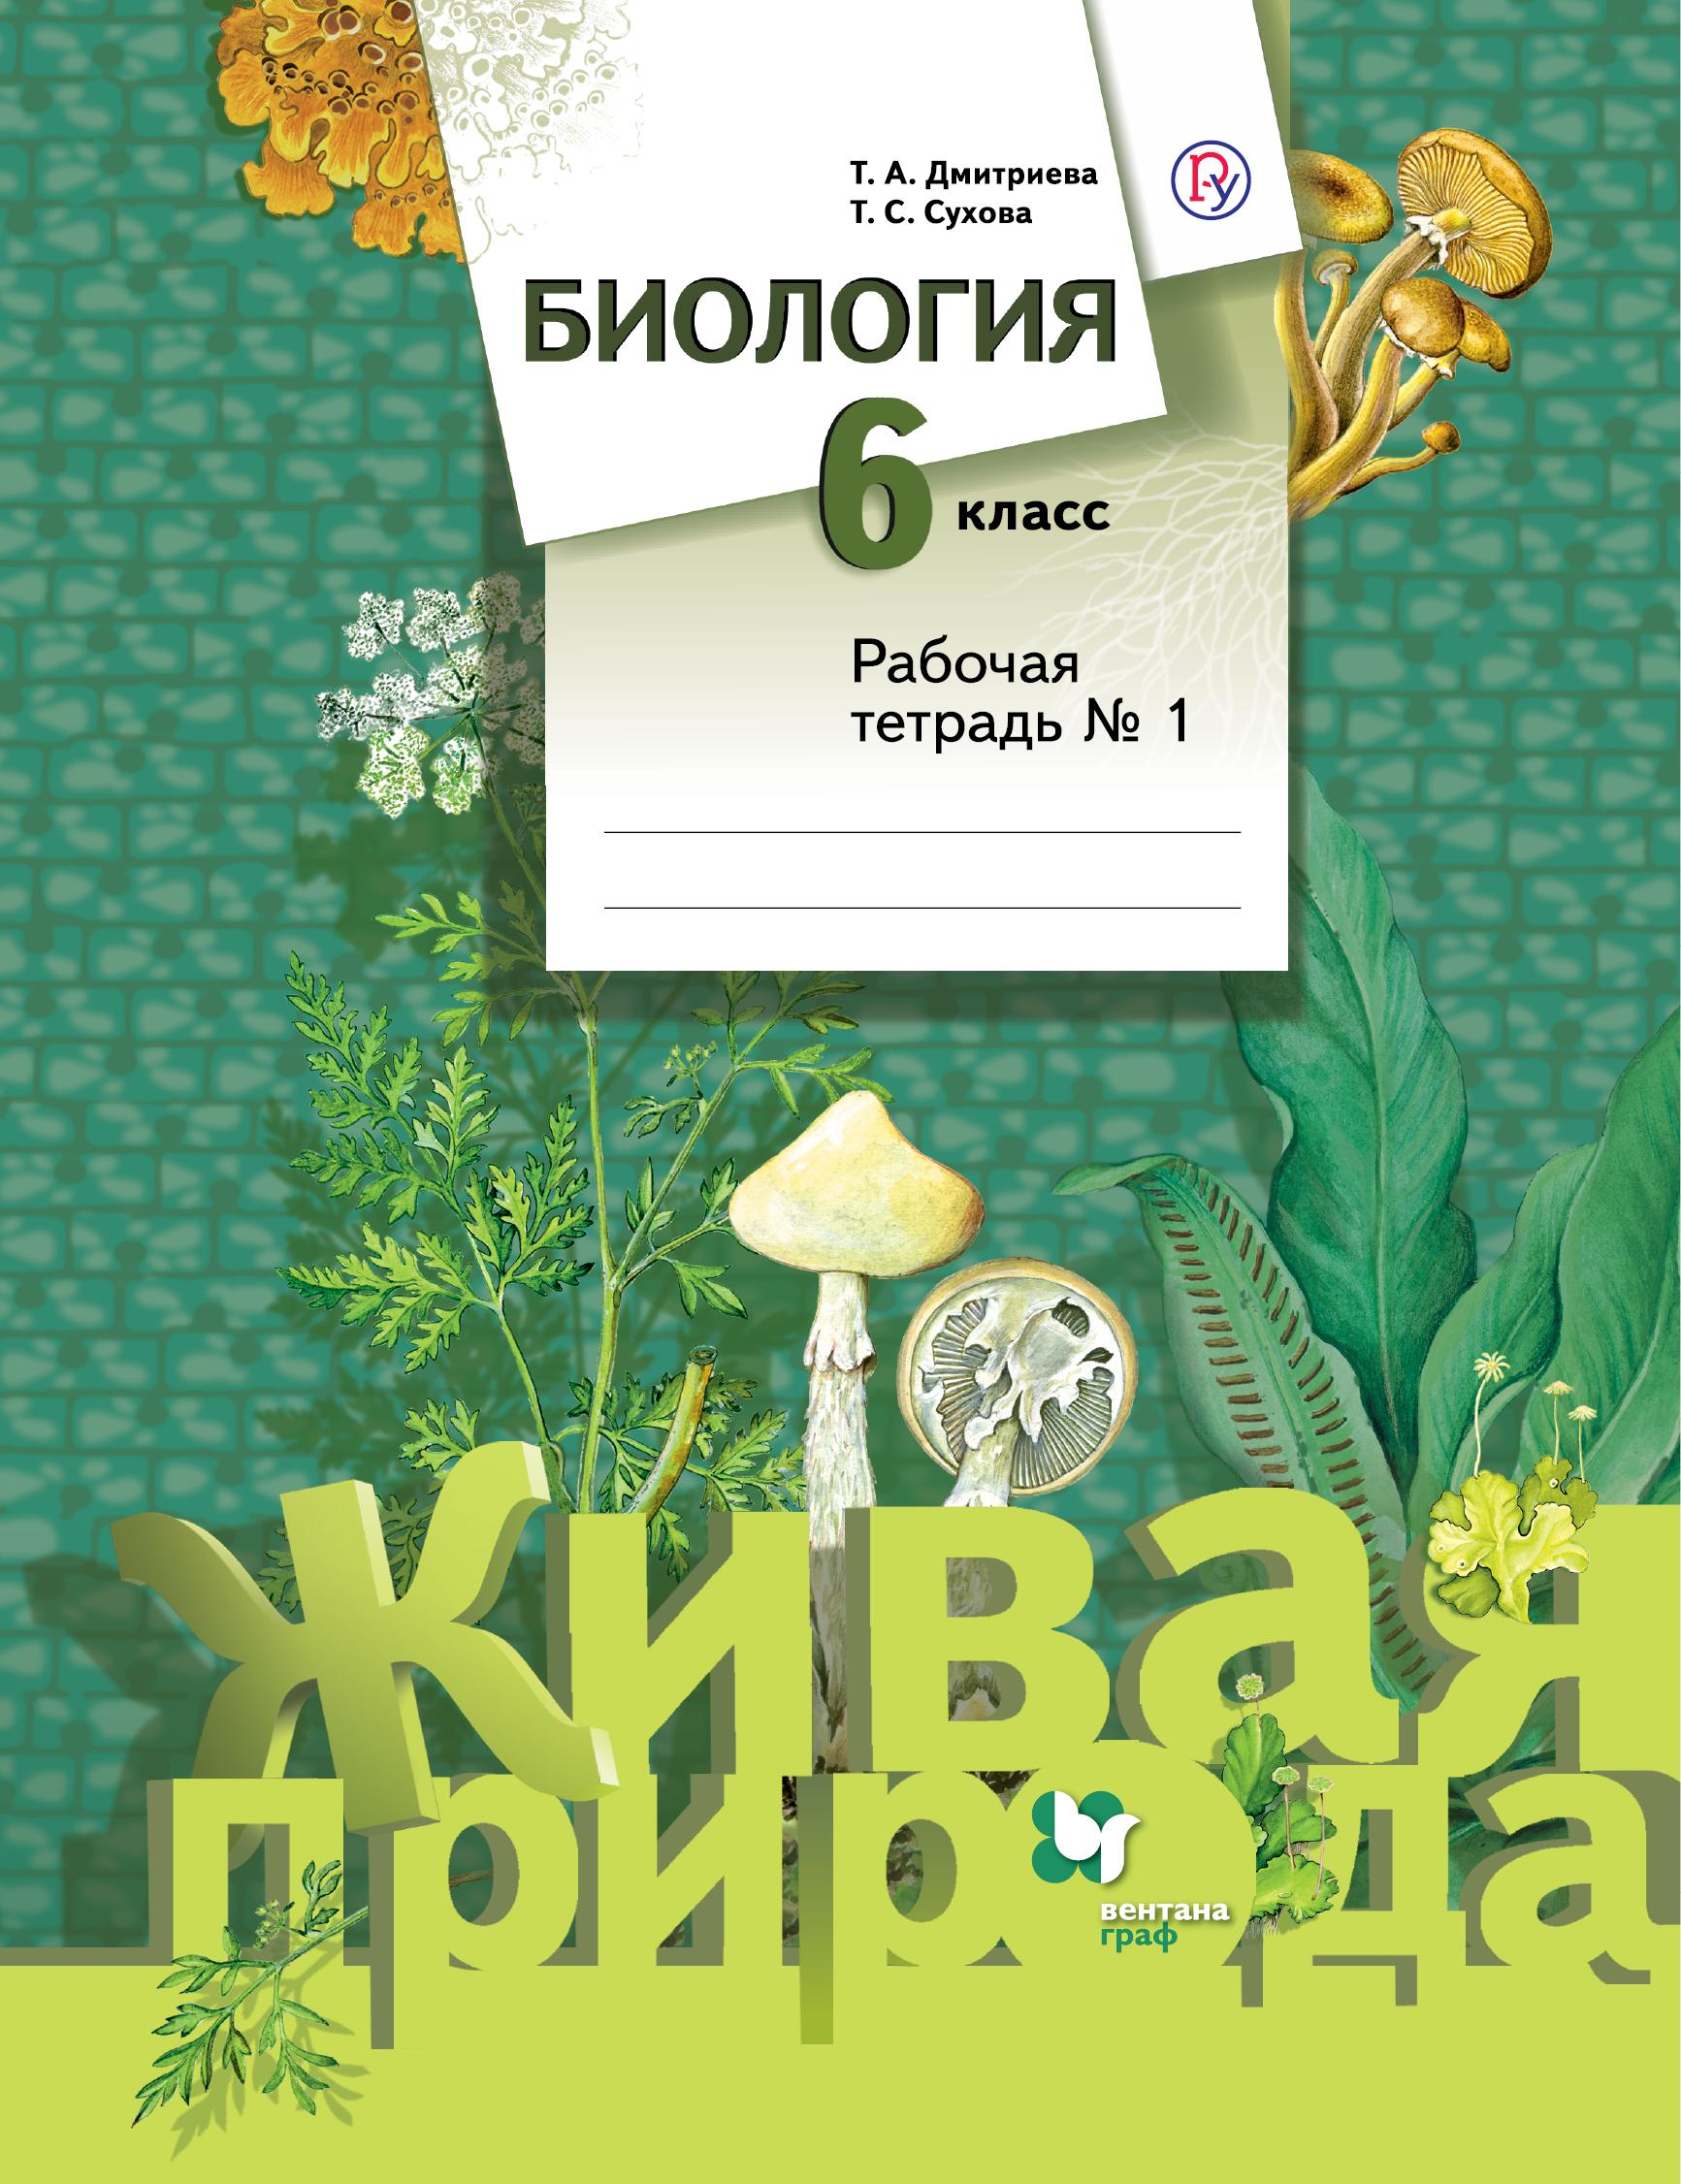 ДмитриеваТ.А. и др. Биология. 6класс. Рабочая тетрадь №1. цены онлайн